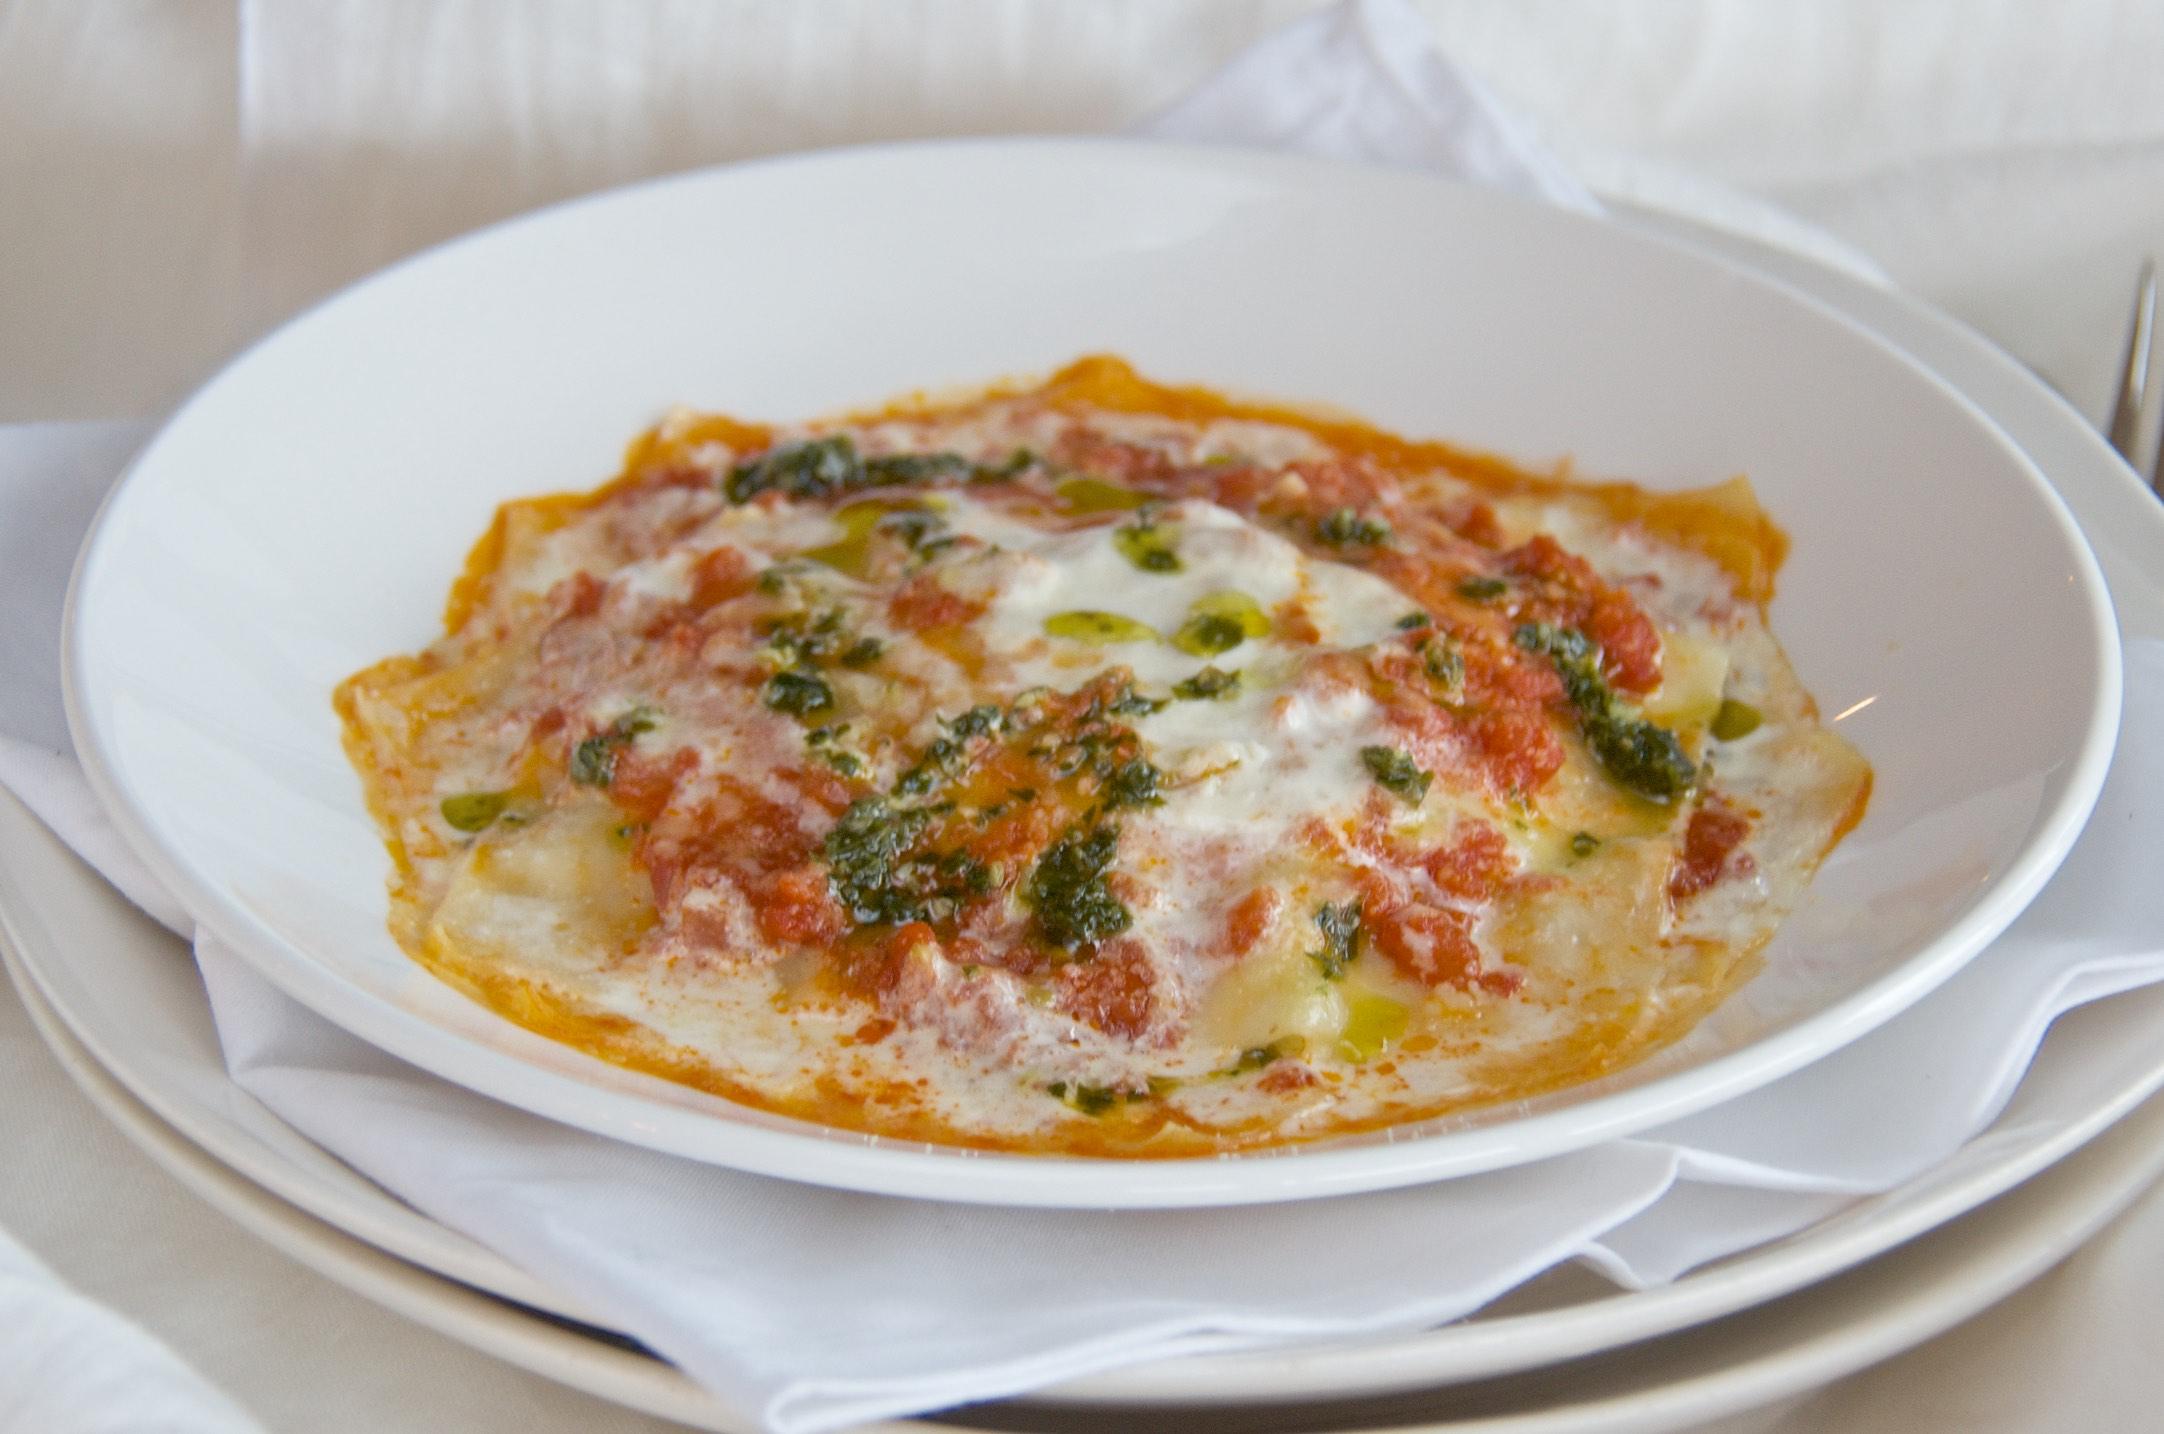 Free form lasagna with ricotta and kale olive oil and lemons dina honke - Pizzeria venecia marbella ...